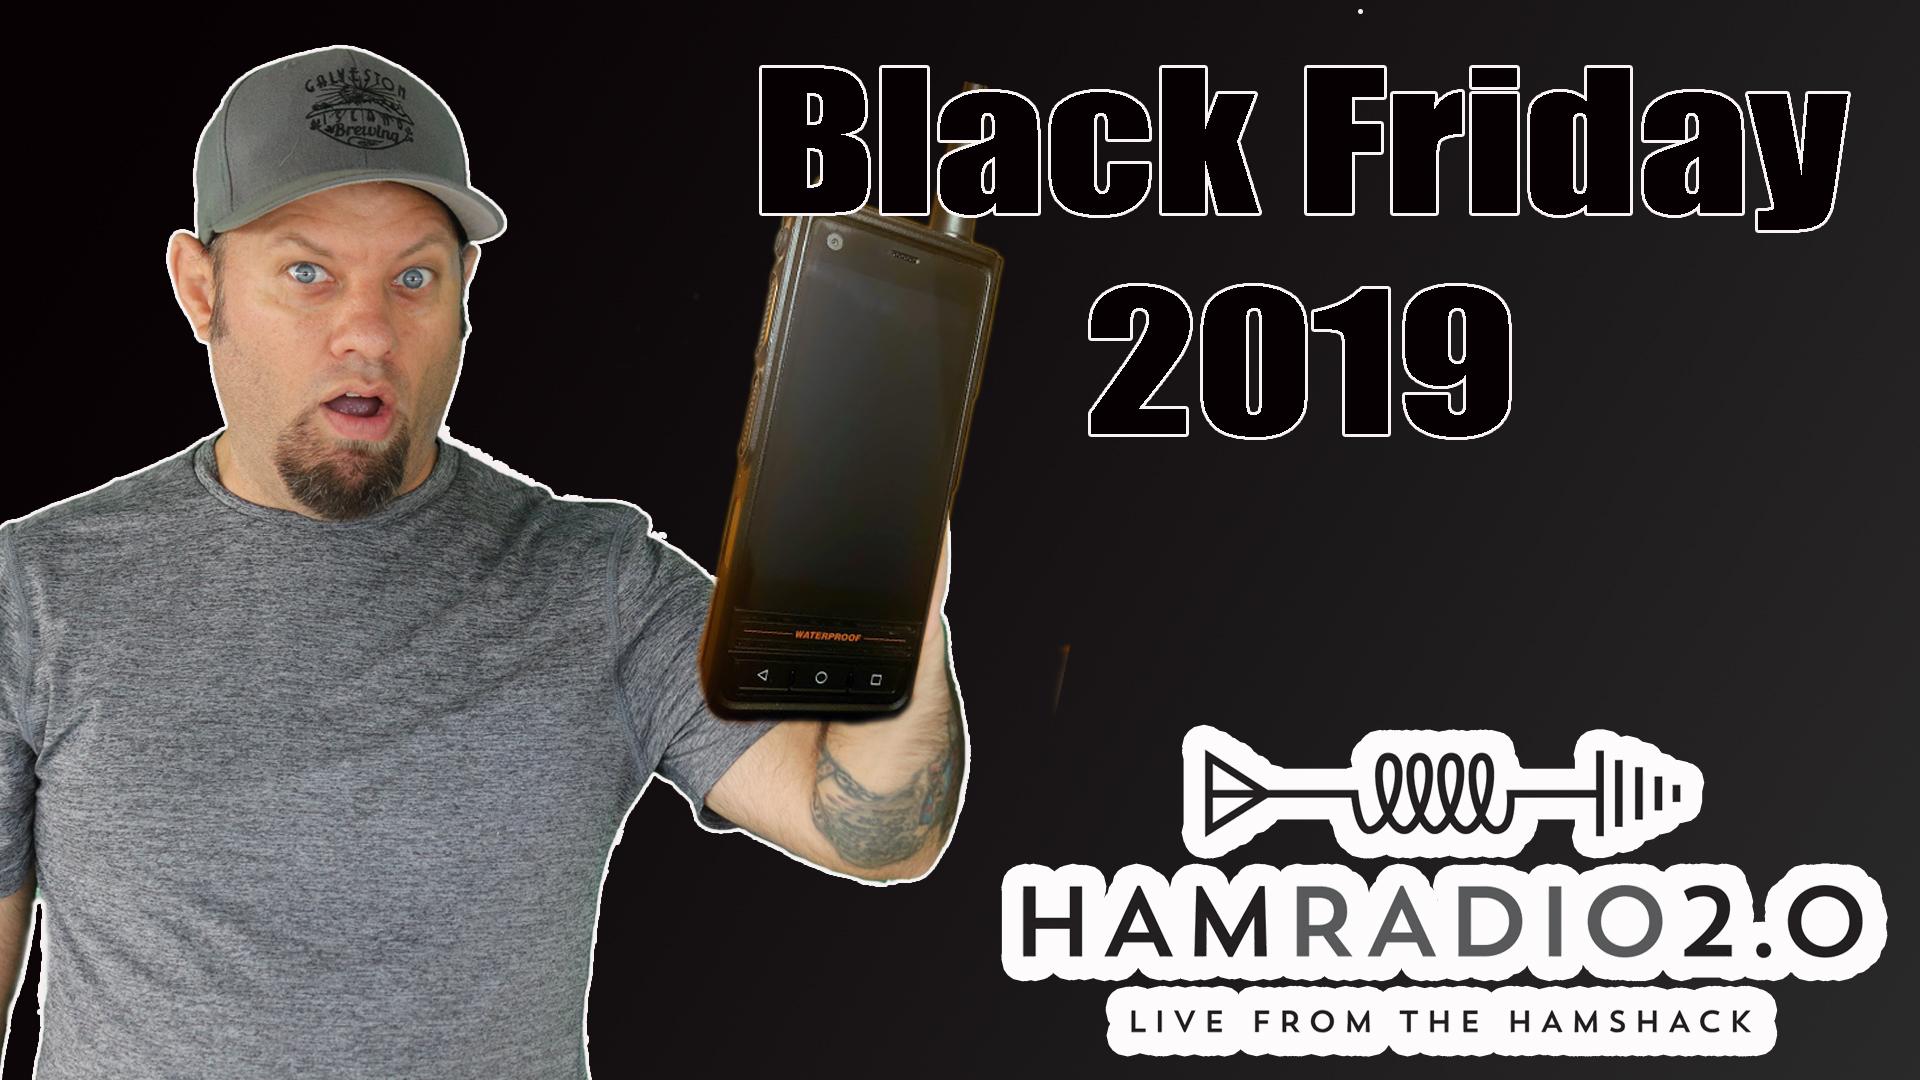 Episode 270: Black Friday 2019 For Ham Radio, Day 2